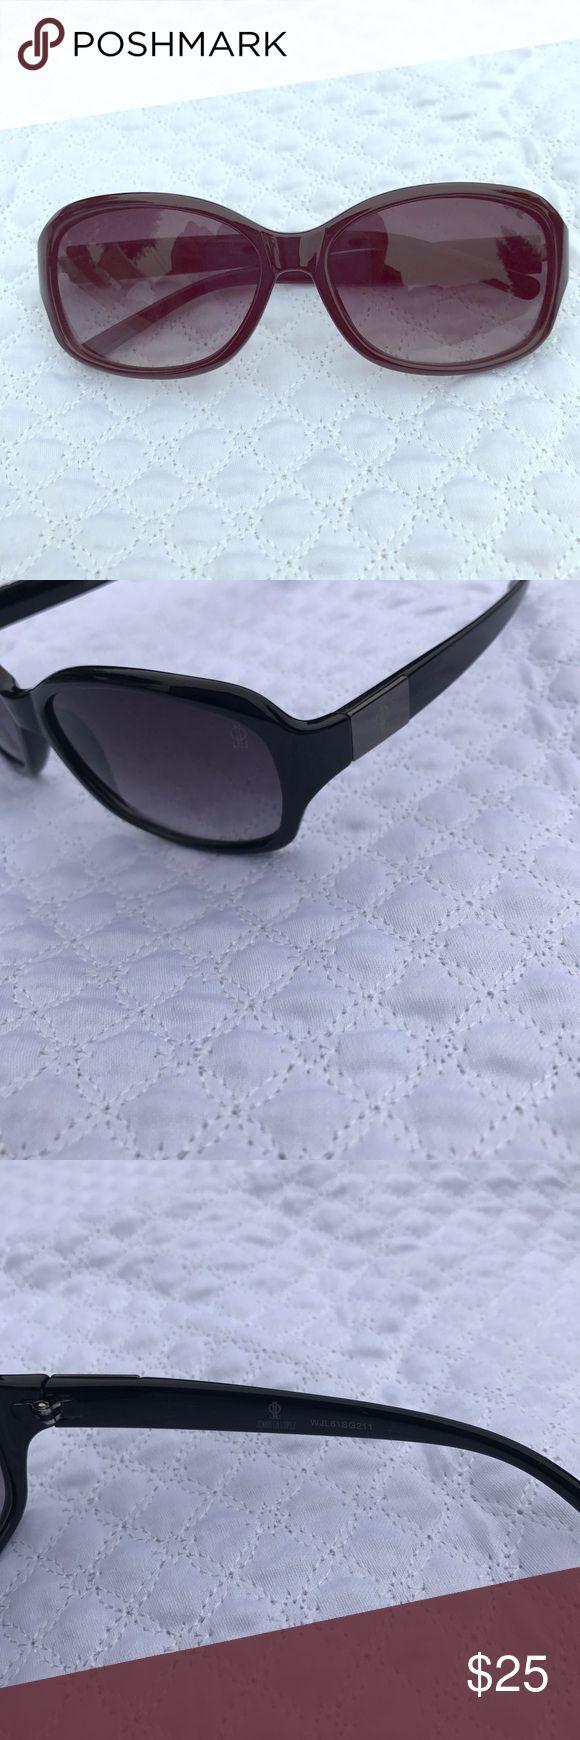 JLo by Jennifer Lopez Black Sunglasses Almost new. No noticeable damage. Jennifer Lopez Accessories Glasses